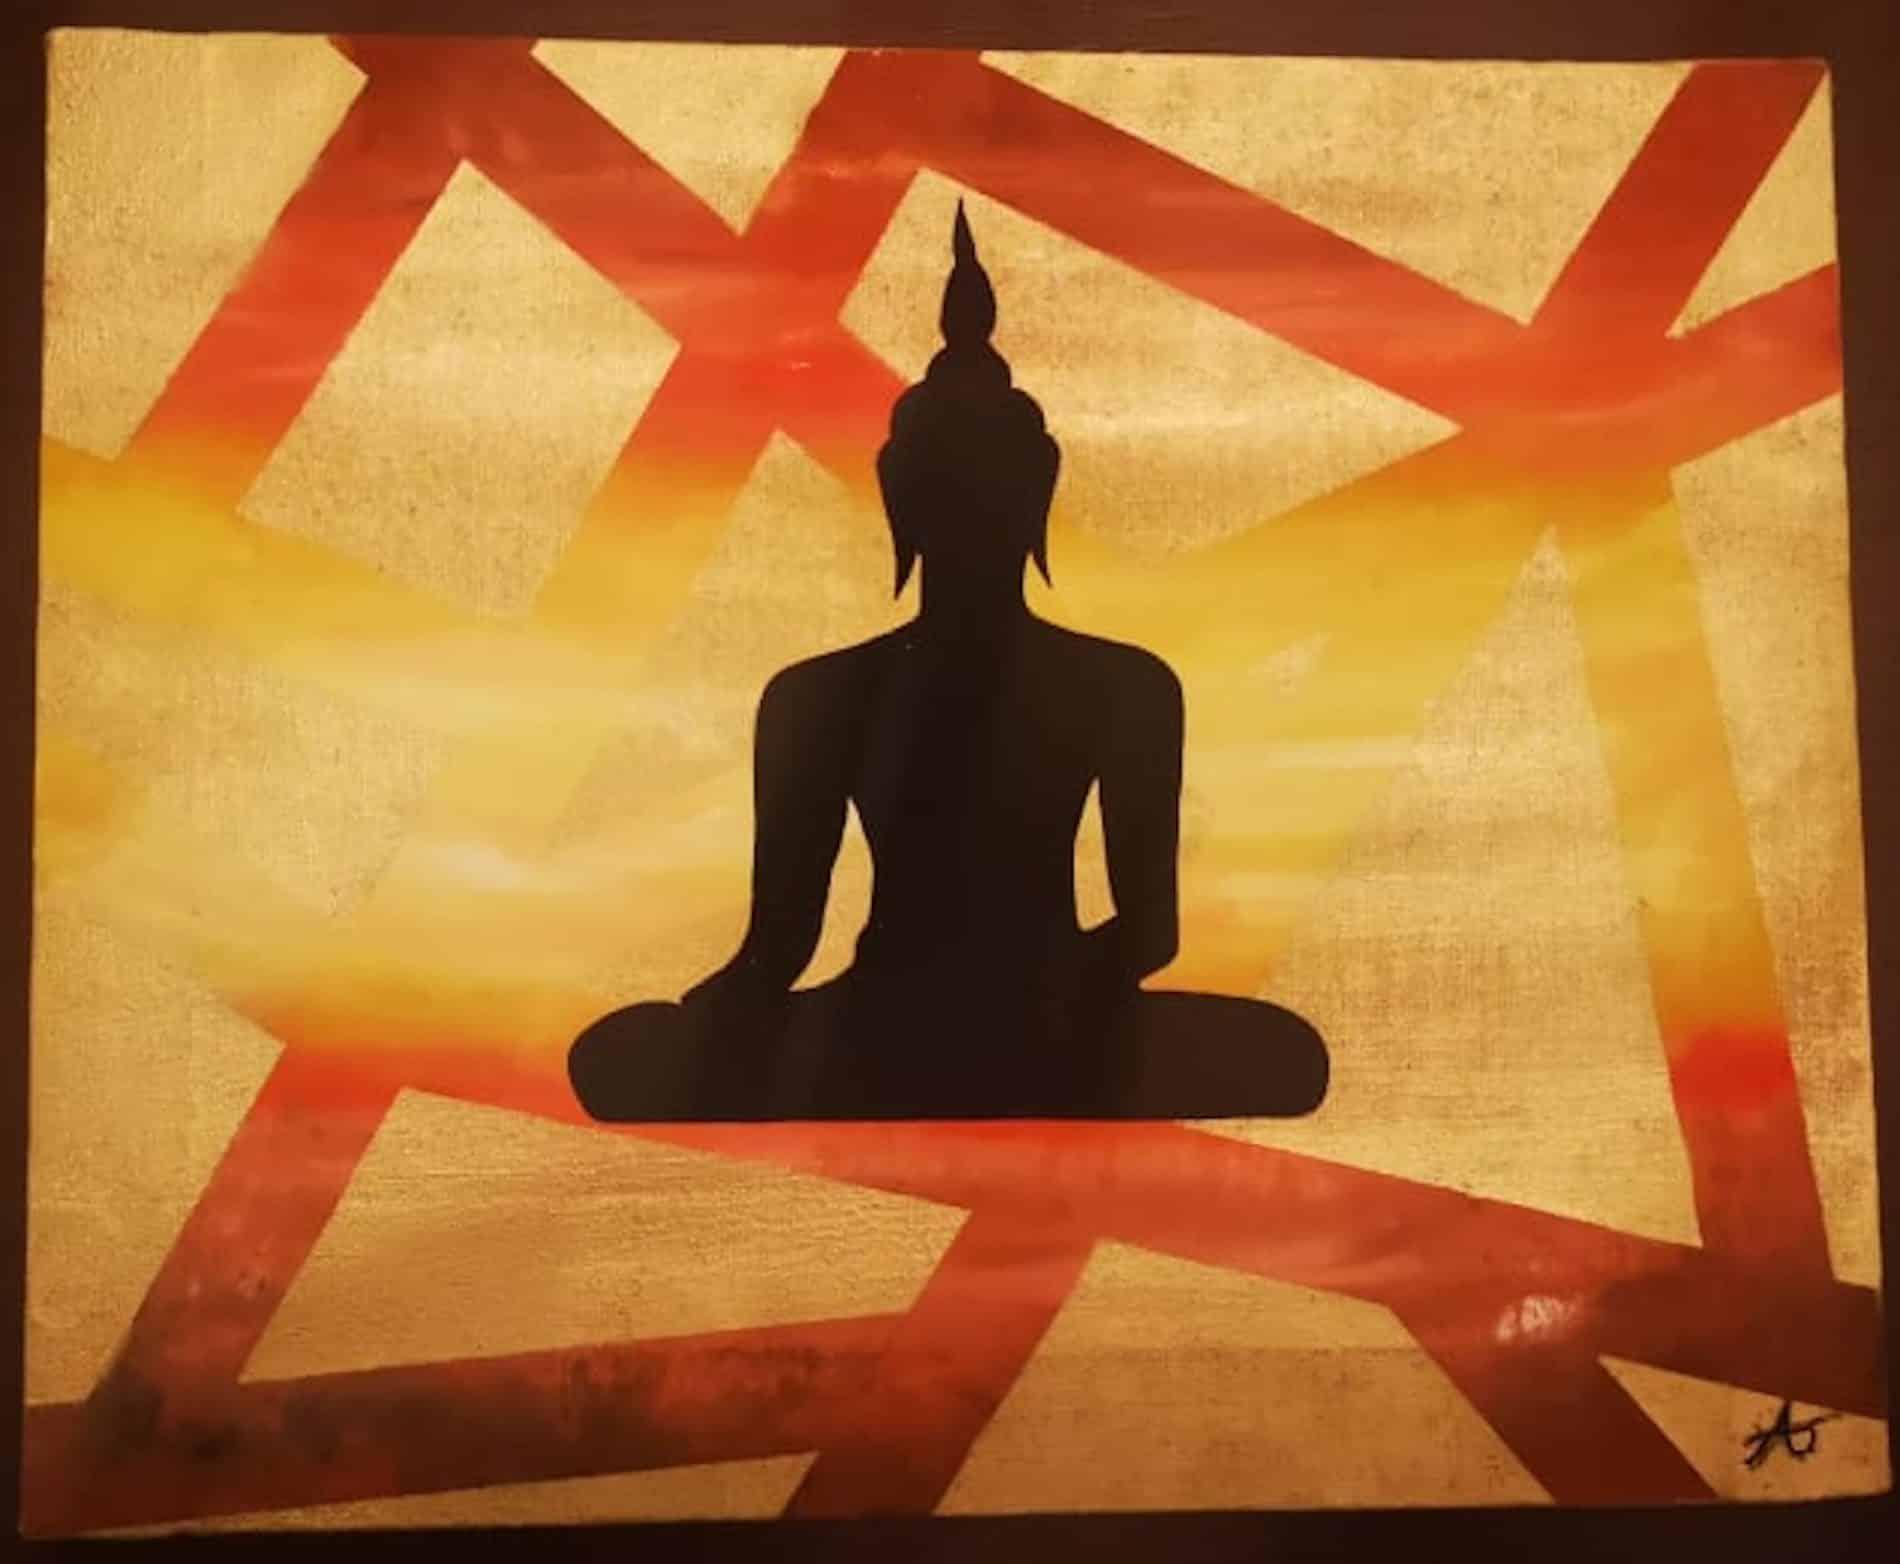 mauritius-arts-anoushka apadoo-lost-imagination